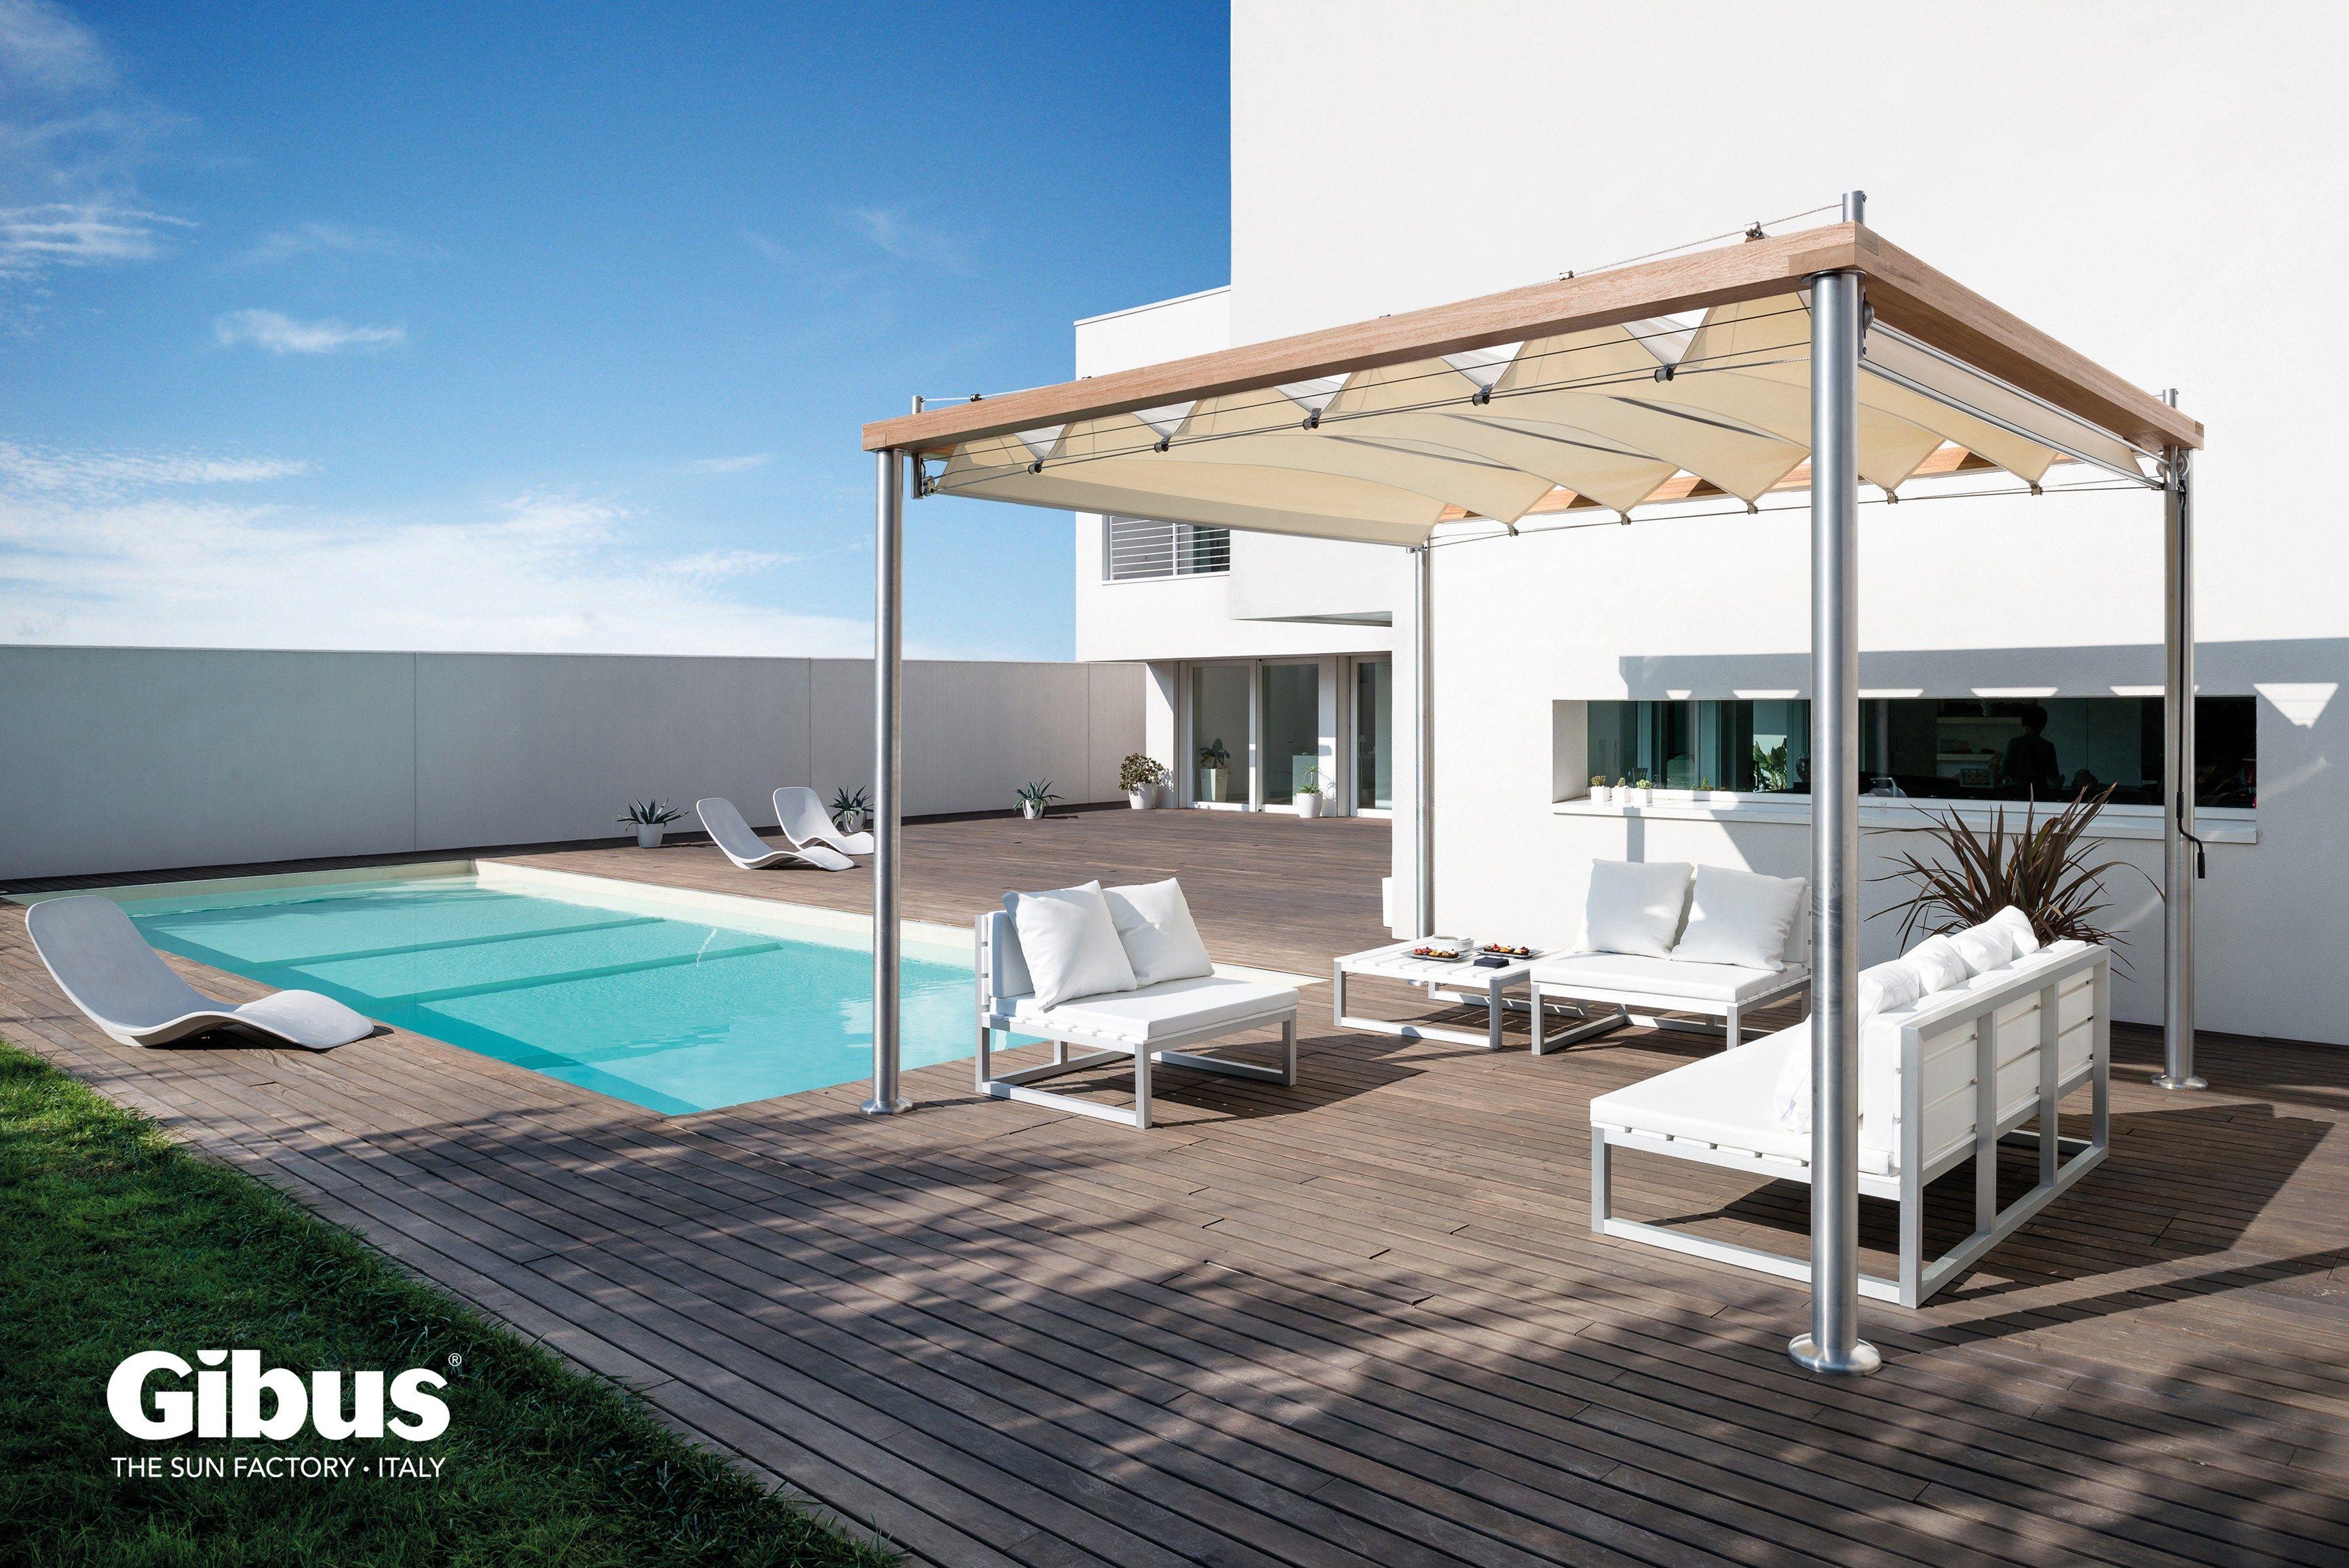 rada pergola avec couverture coulissante by gibus. Black Bedroom Furniture Sets. Home Design Ideas